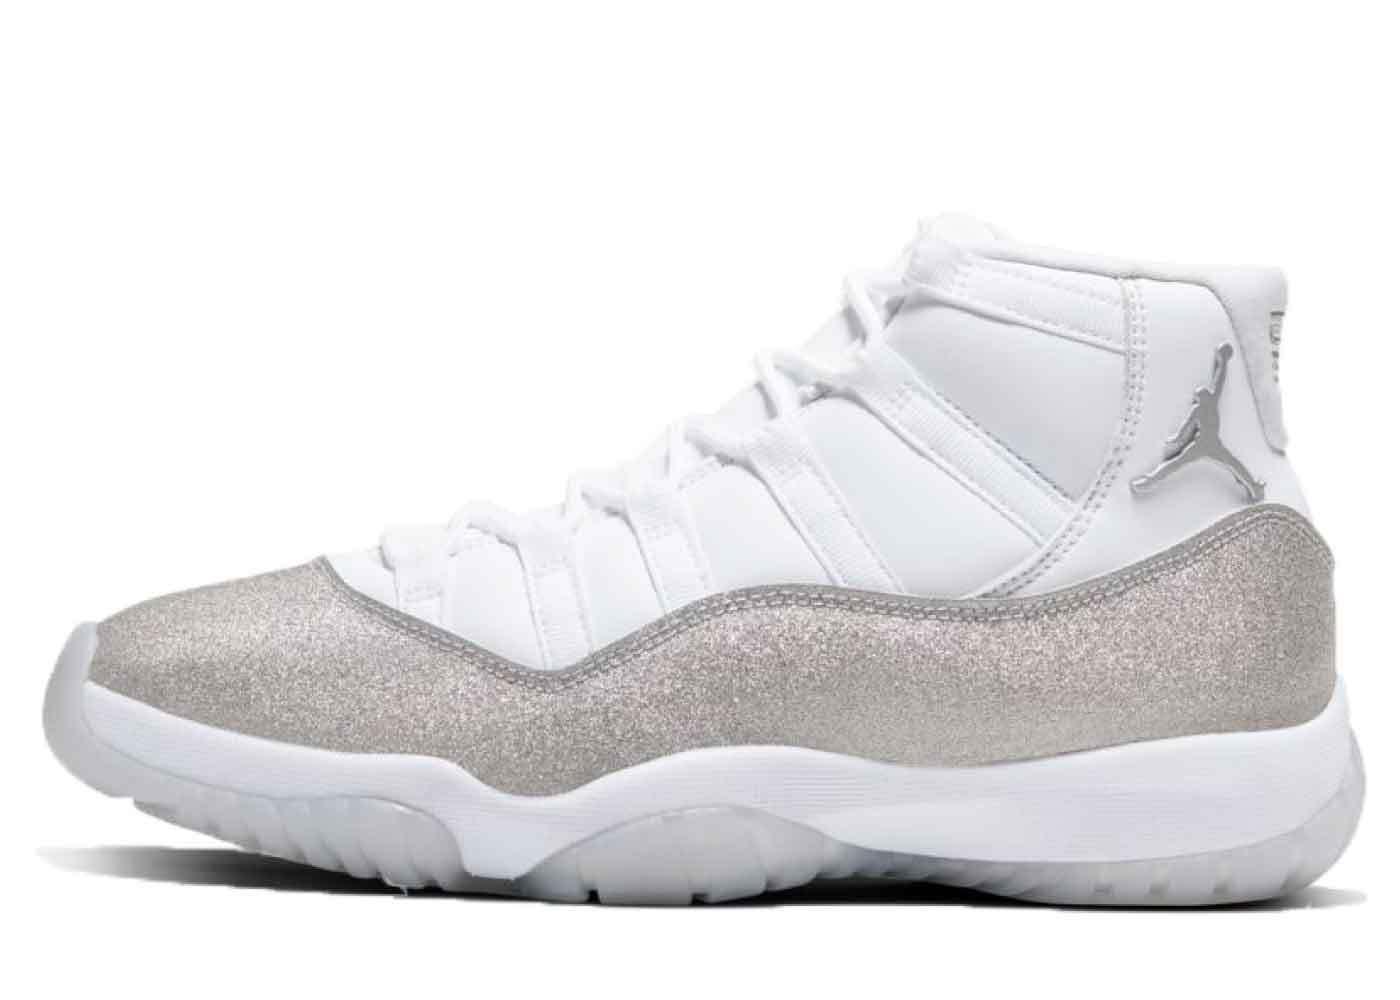 Nike Air Jordan 11 Retro White Metallic Silver Womensの写真